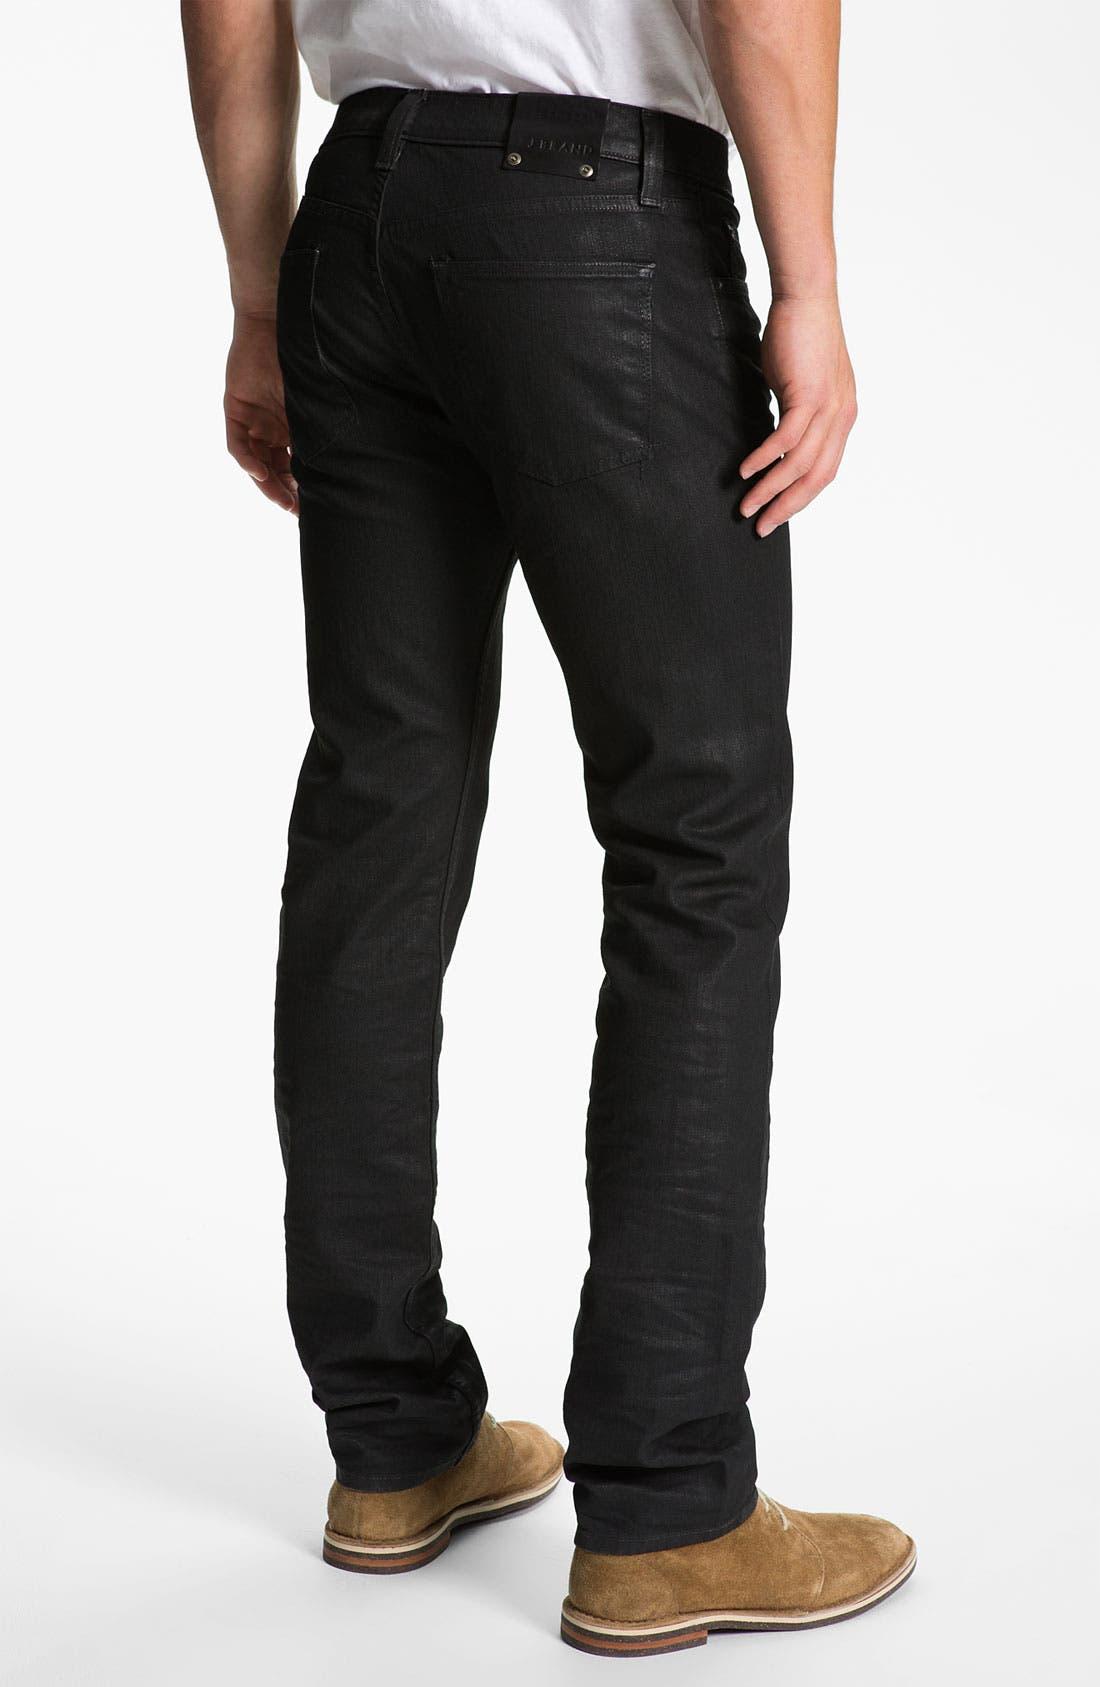 Alternate Image 1 Selected - J Brand 'Kane' Slim Fit Jeans (Underground)